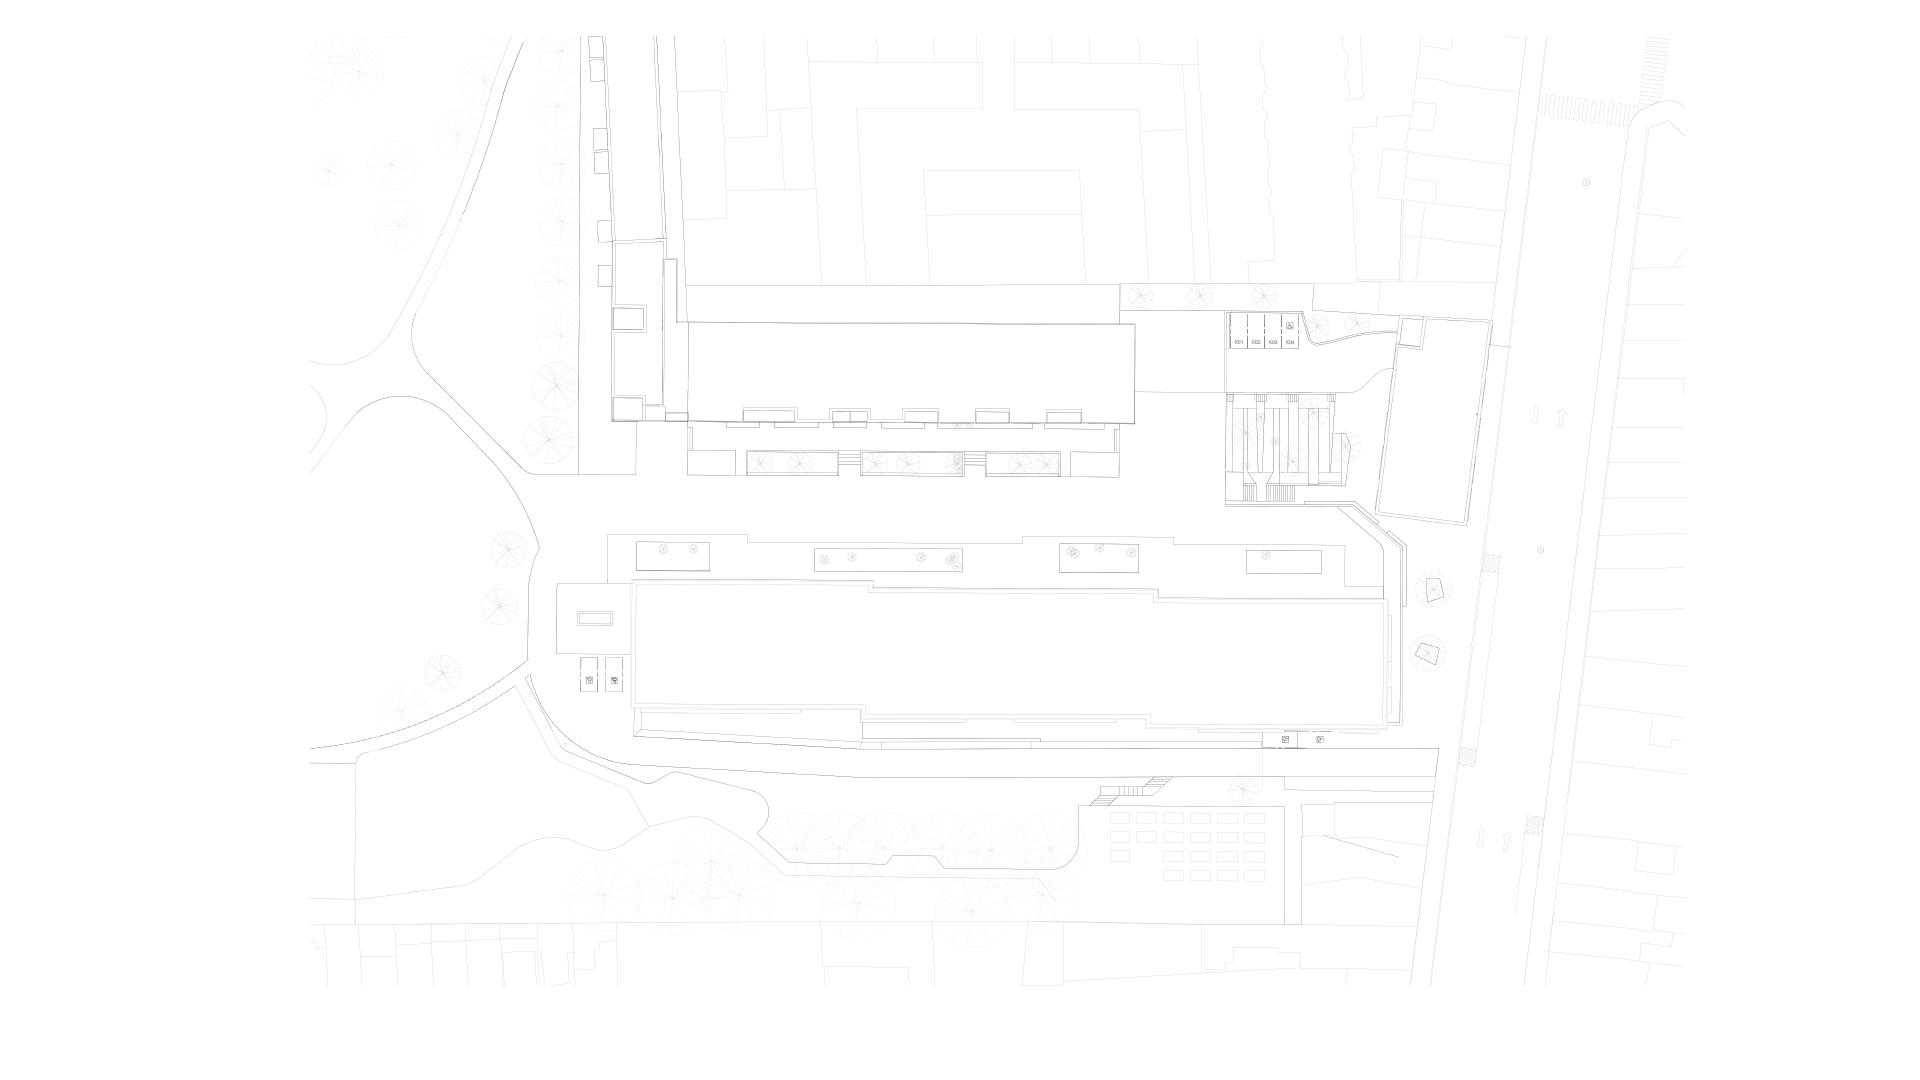 Rauter, plein, Anderlecht-1164292498